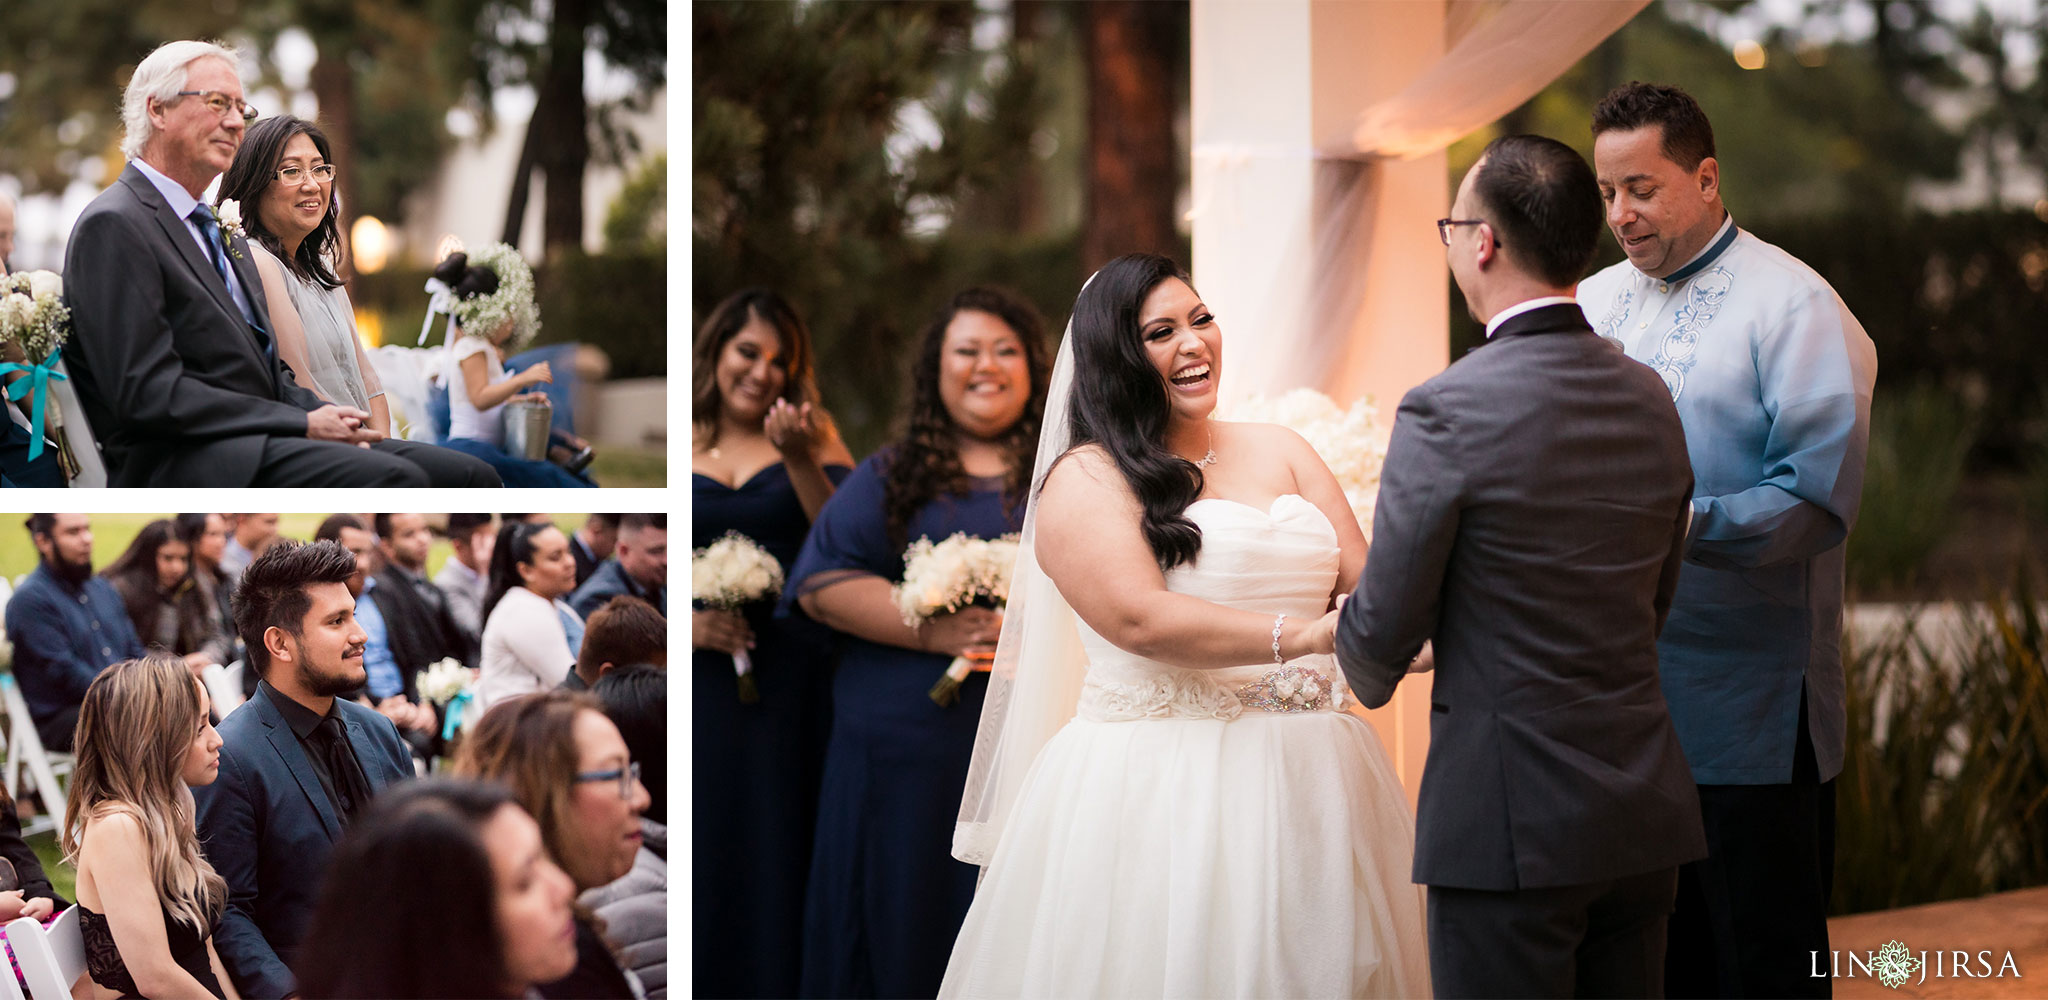 24 turnip rose promenade orange county wedding ceremony photography